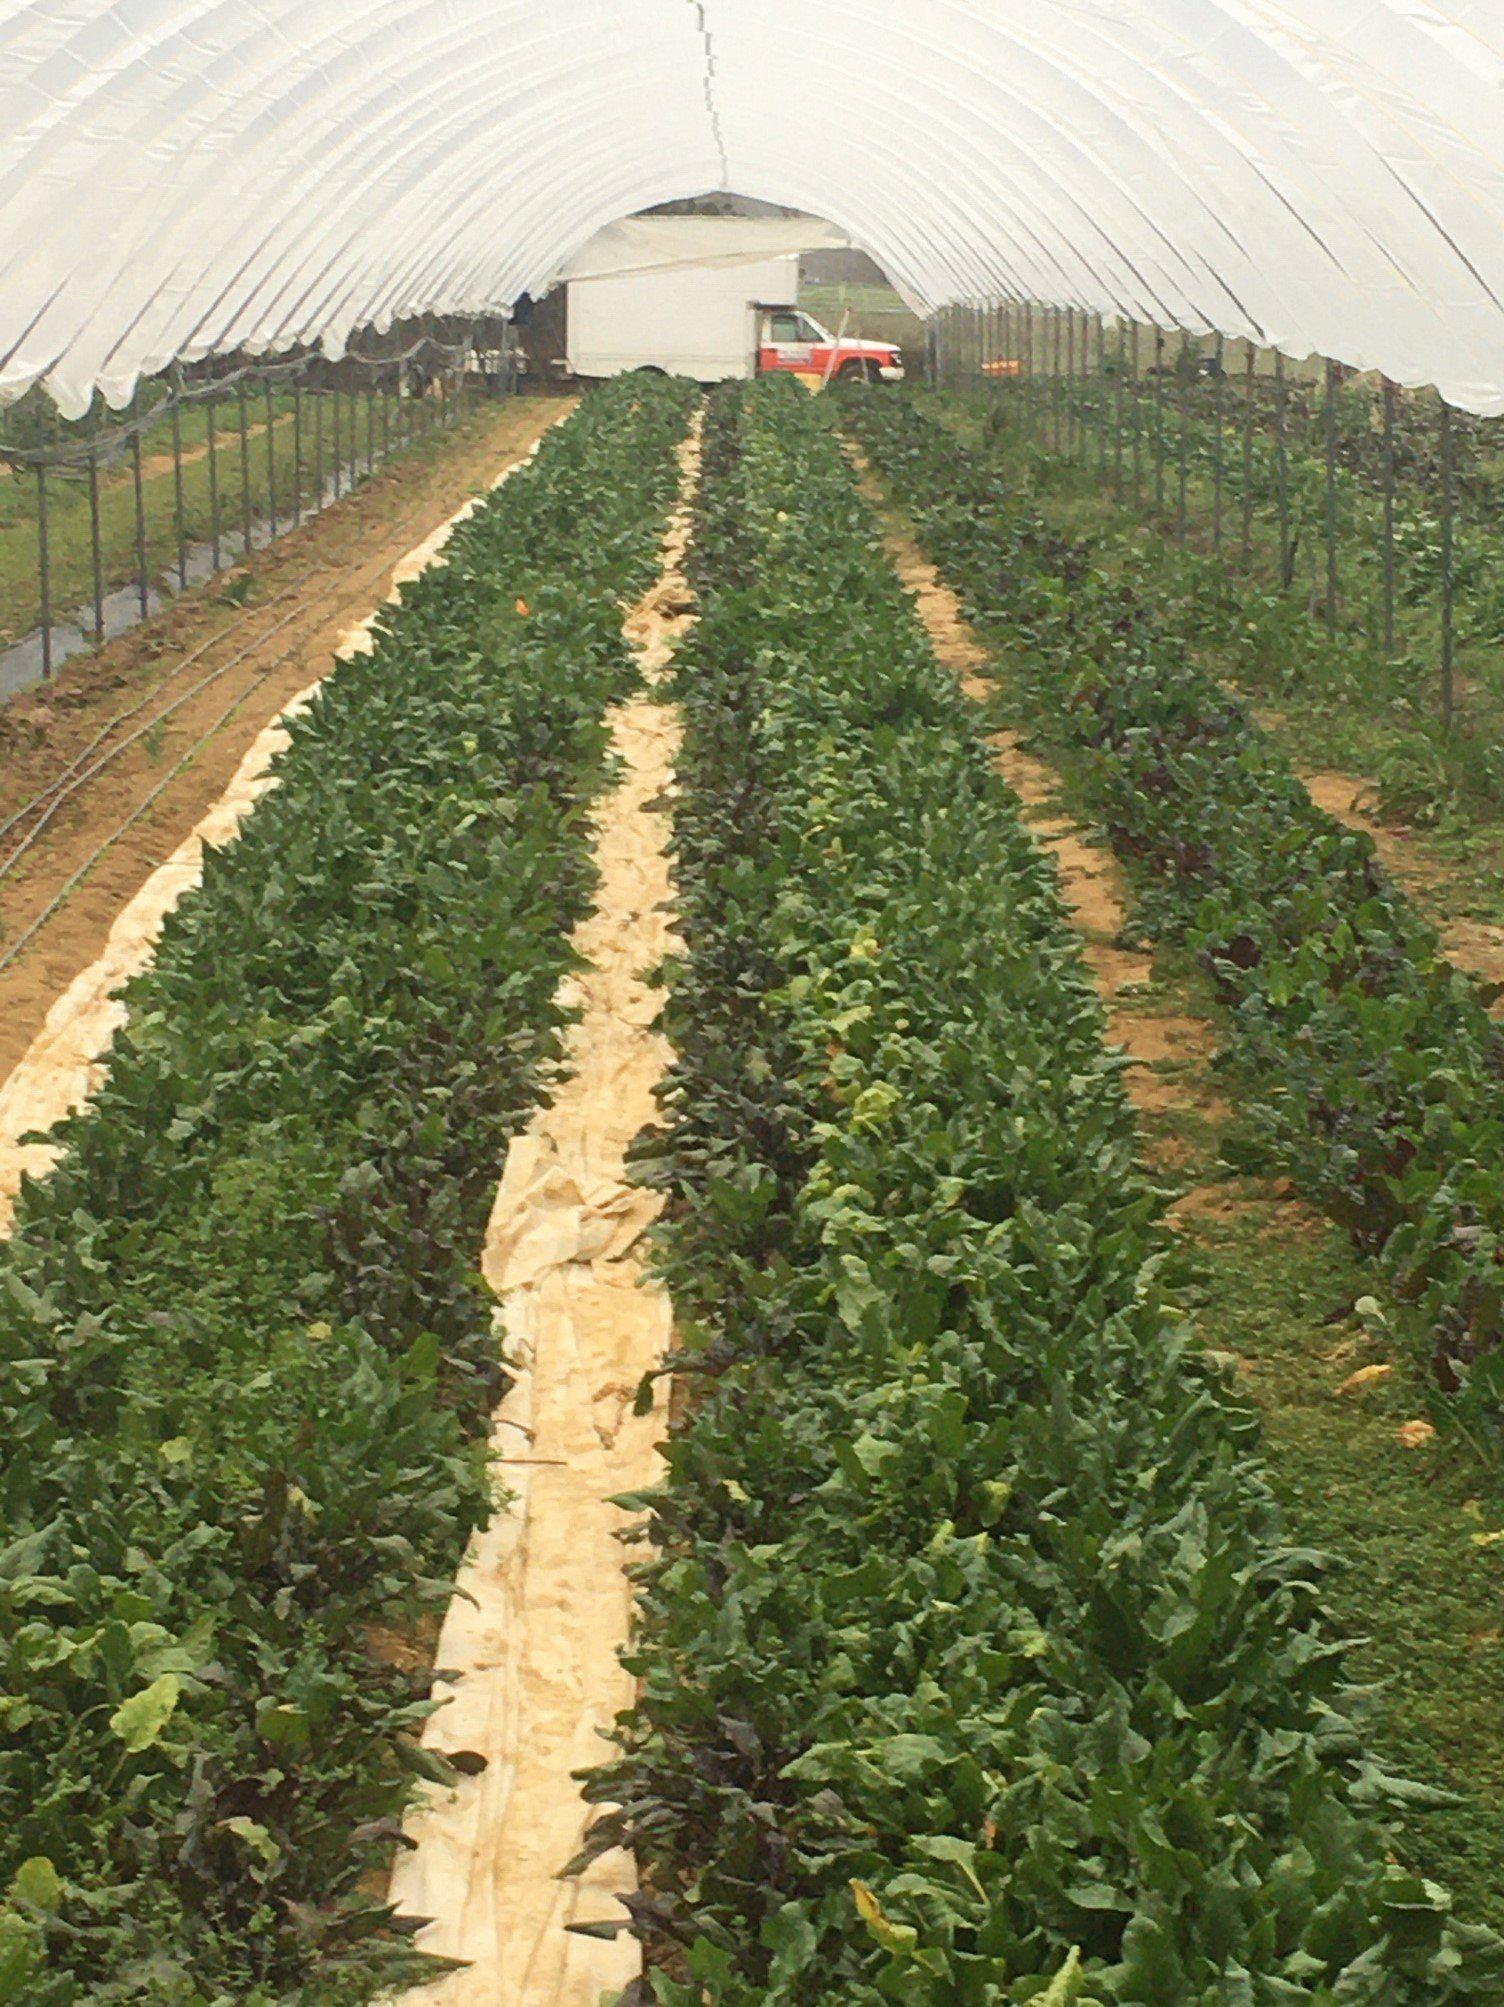 Next Happening: Farm Happenings for February 24, 2020